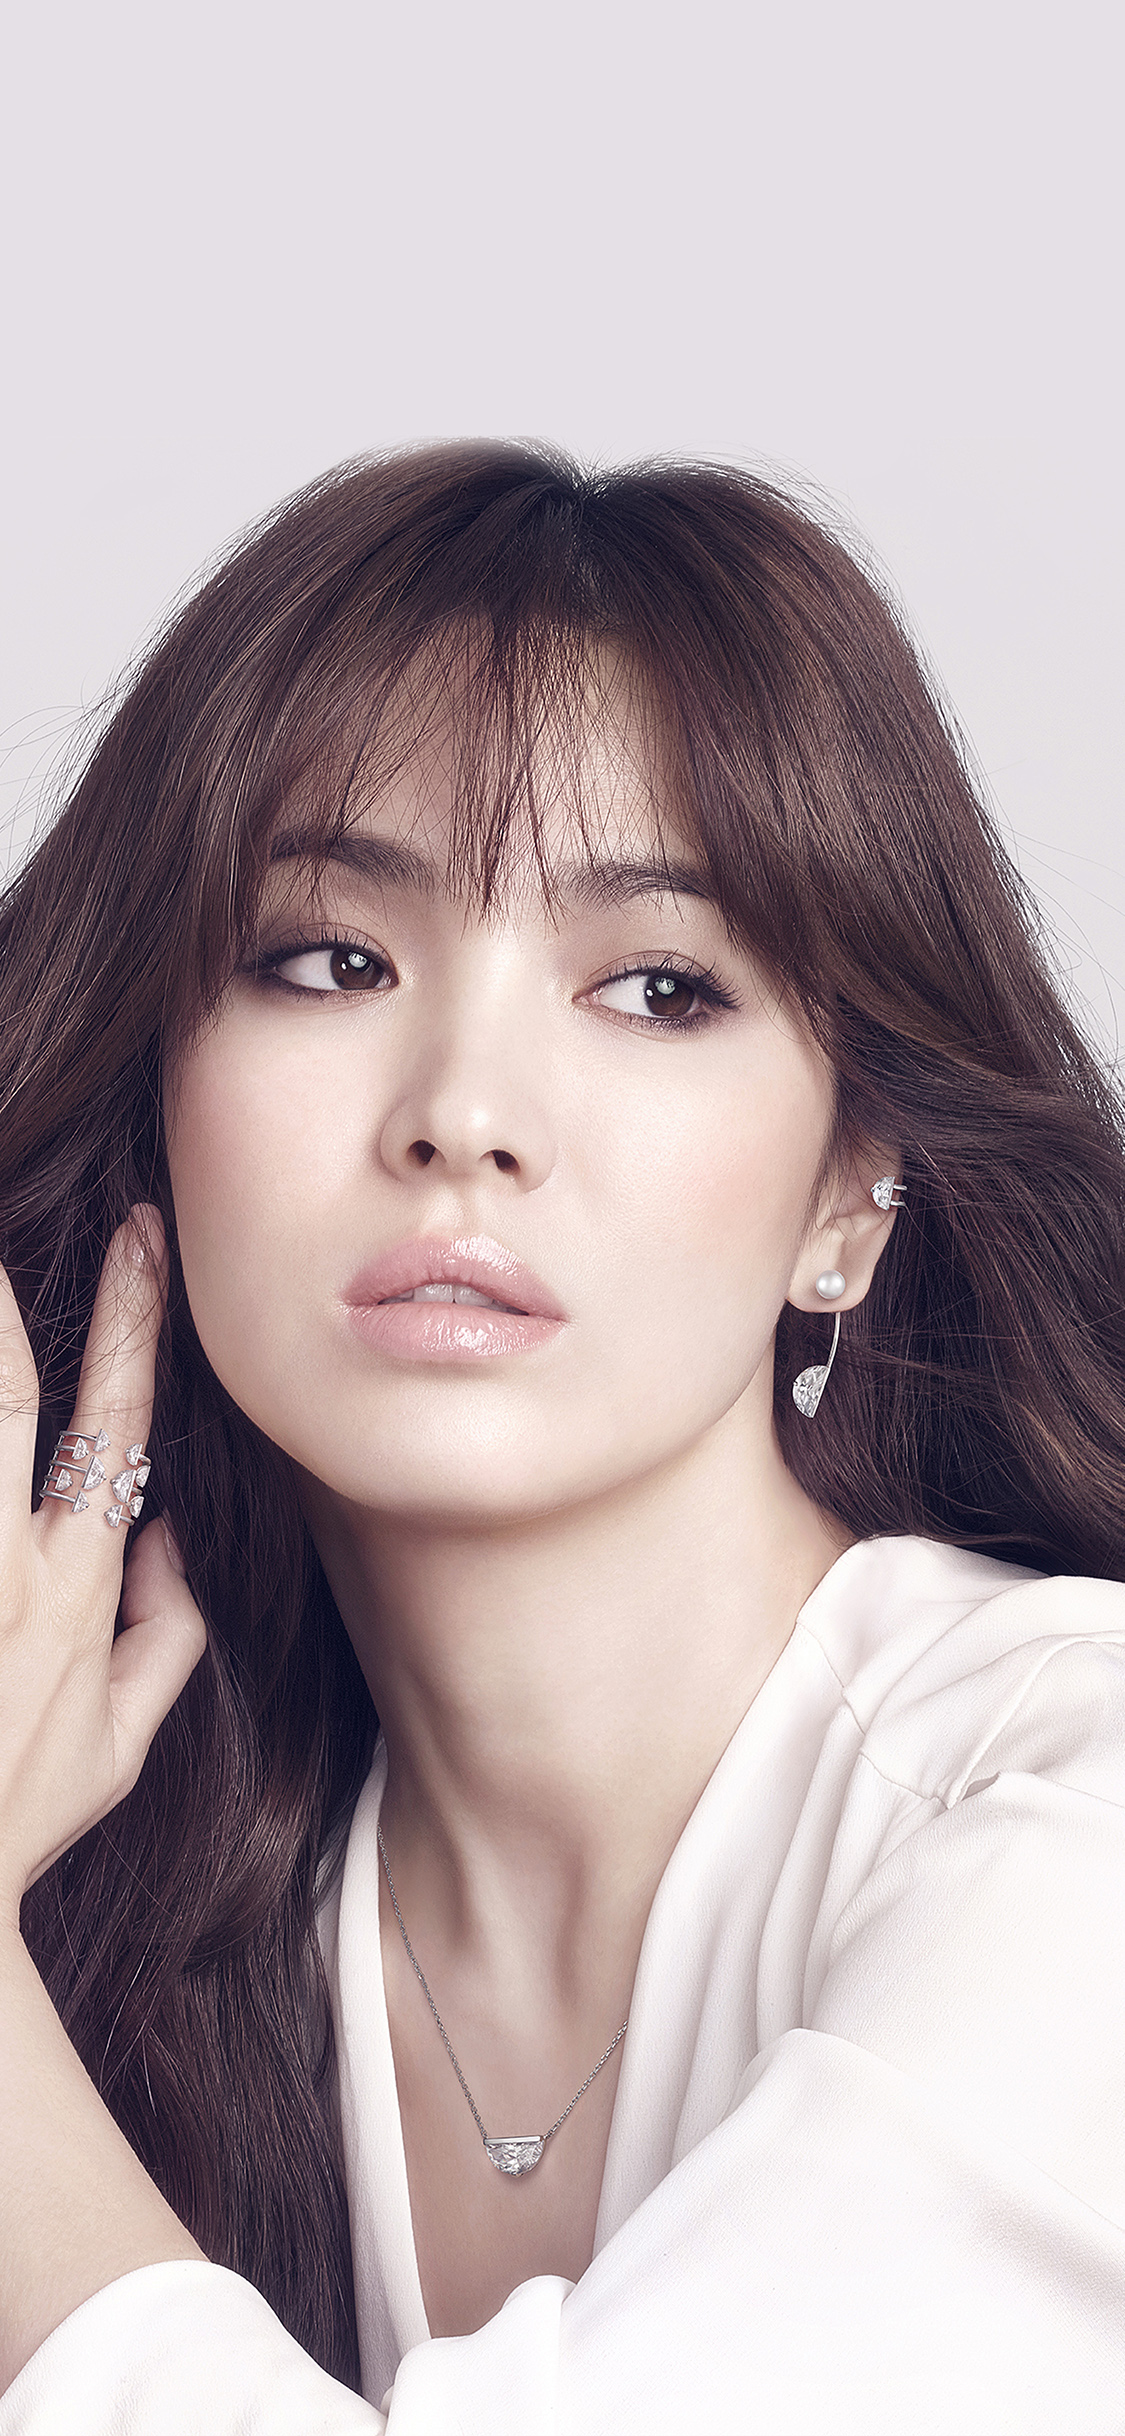 iPhoneXpapers.com-Apple-iPhone-wallpaper-hi21-kpop-song-hyekyo-film-actress